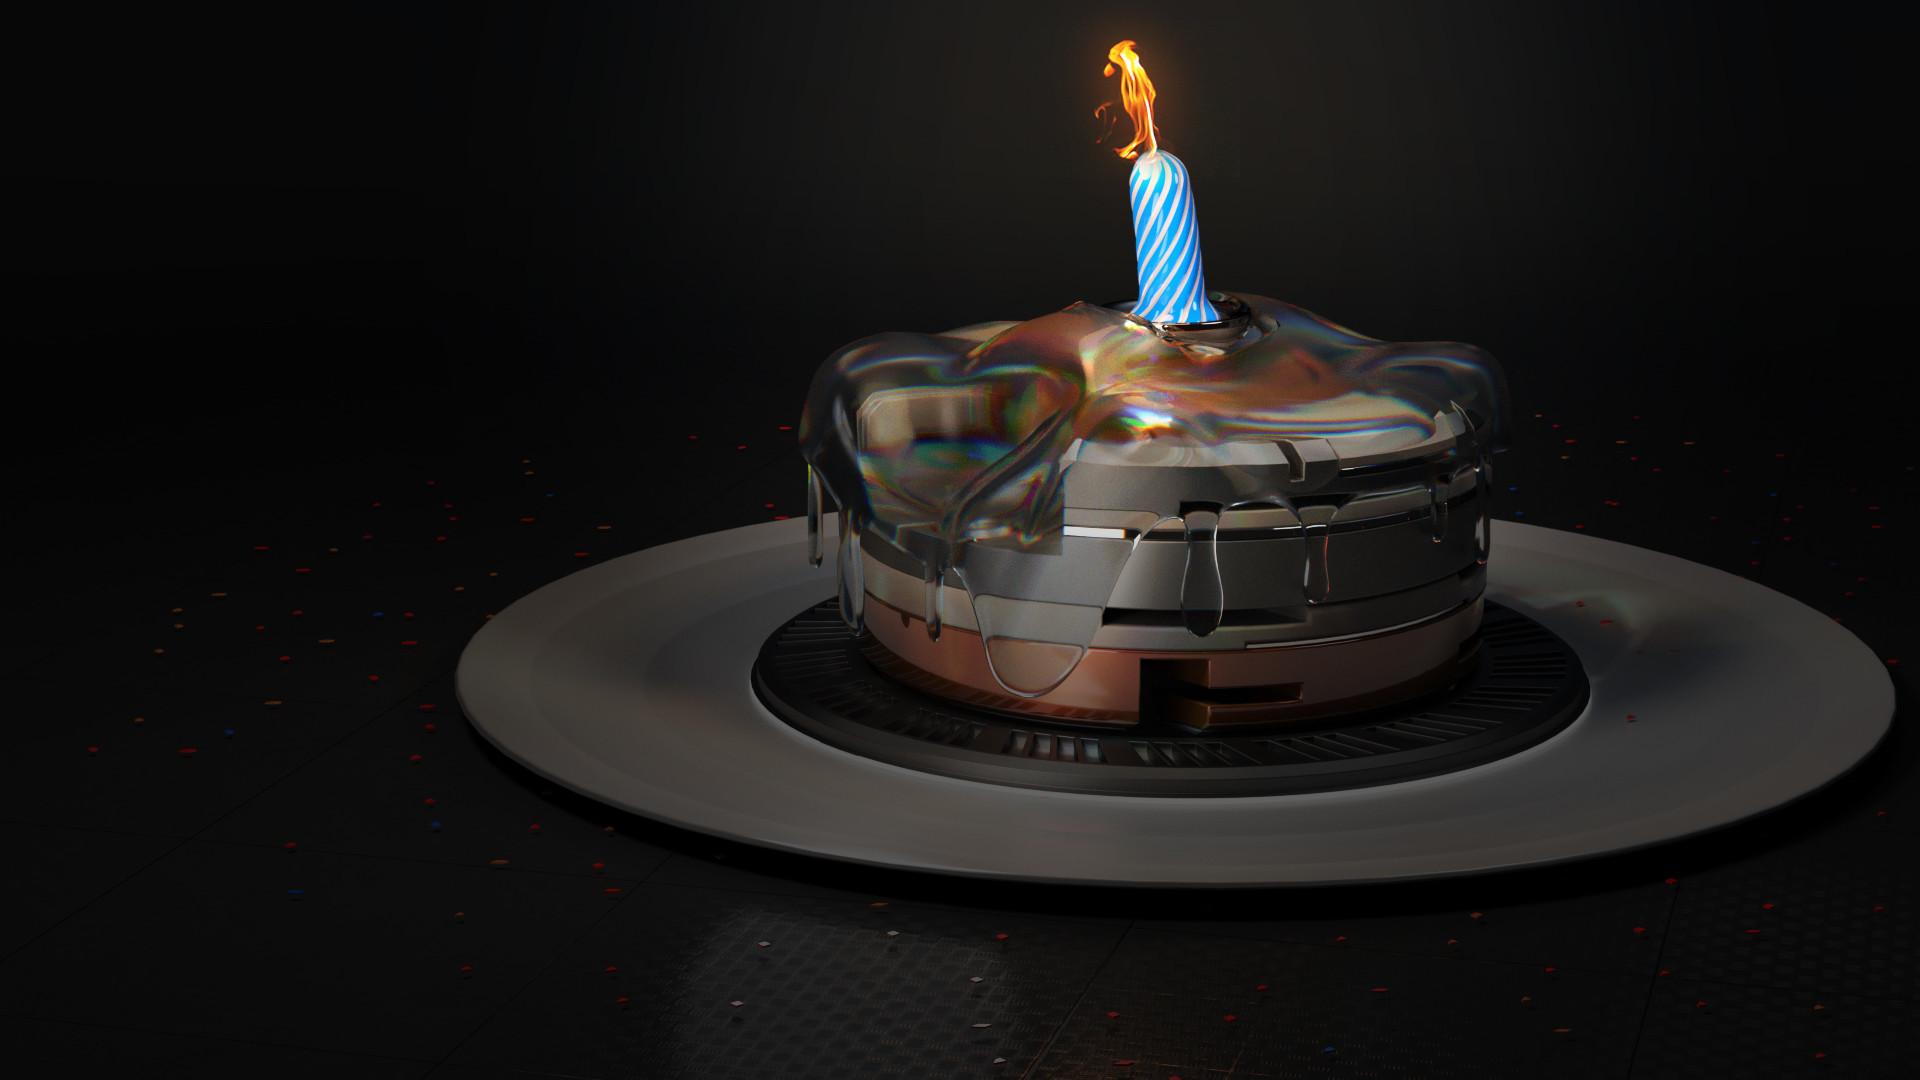 Jerry perkins mx1001 cake